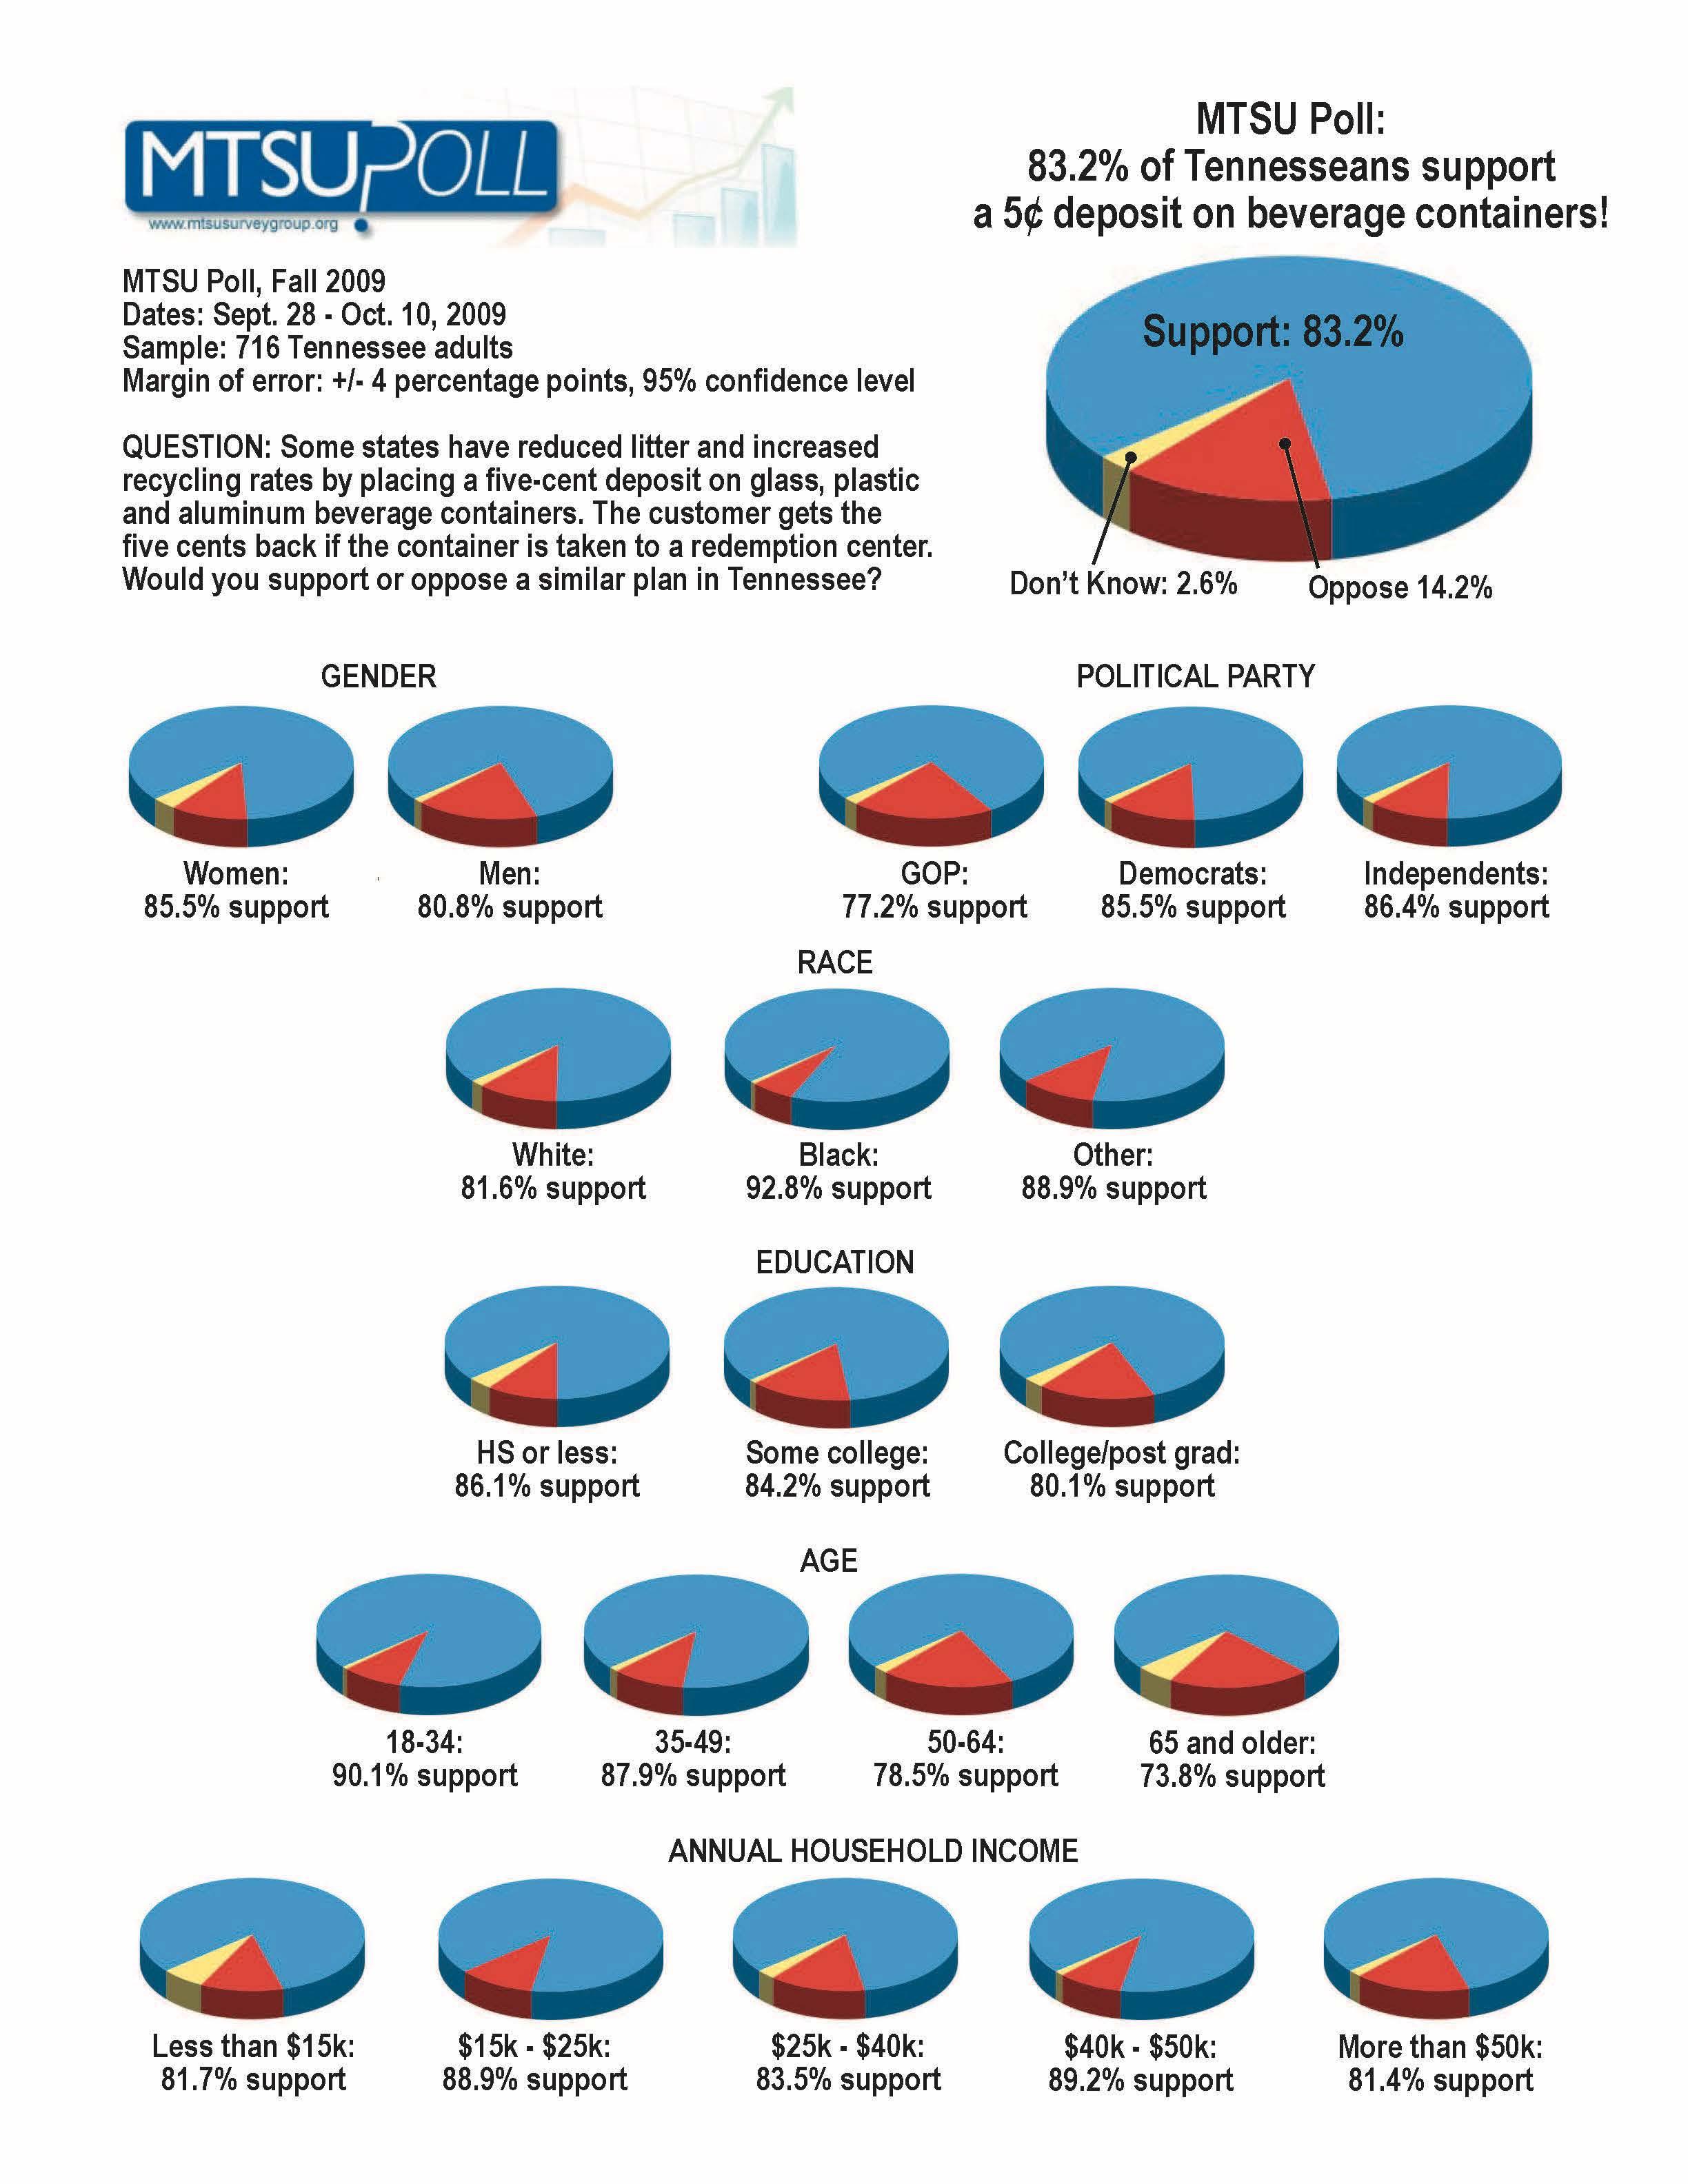 MTSU Poll Results Image.jpg